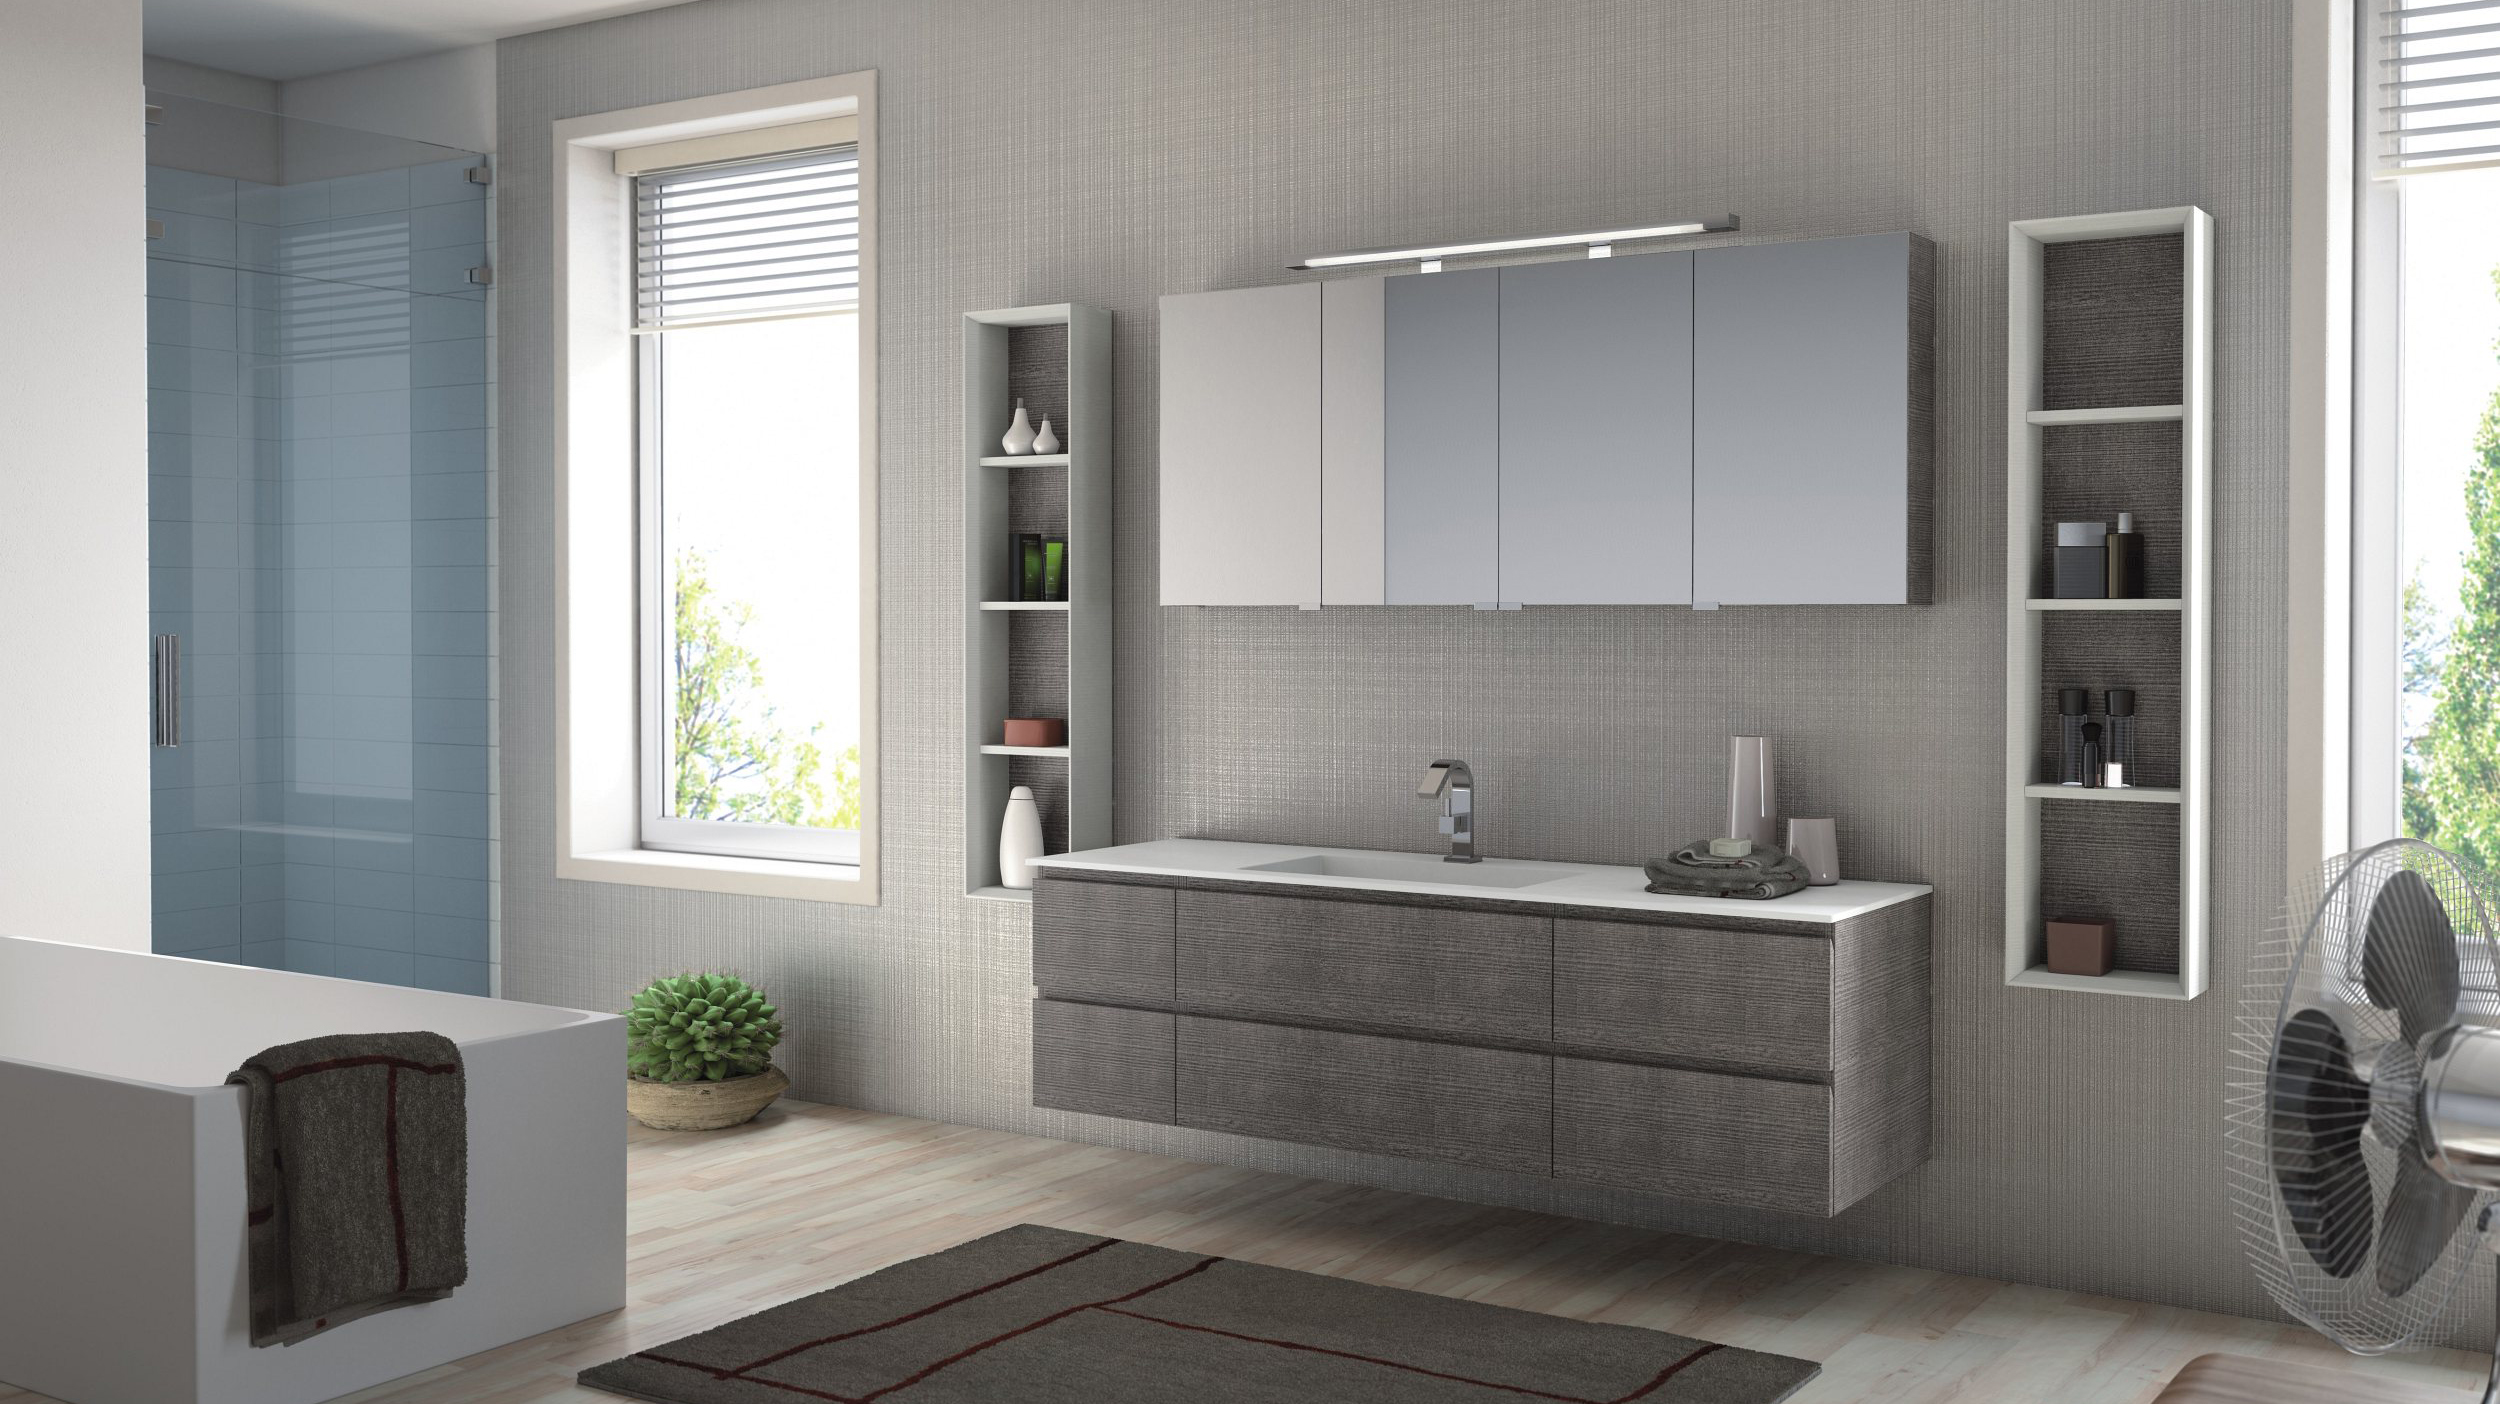 young t 12 individual badm bel mit waschtisch fugenlos mein bad direkt. Black Bedroom Furniture Sets. Home Design Ideas